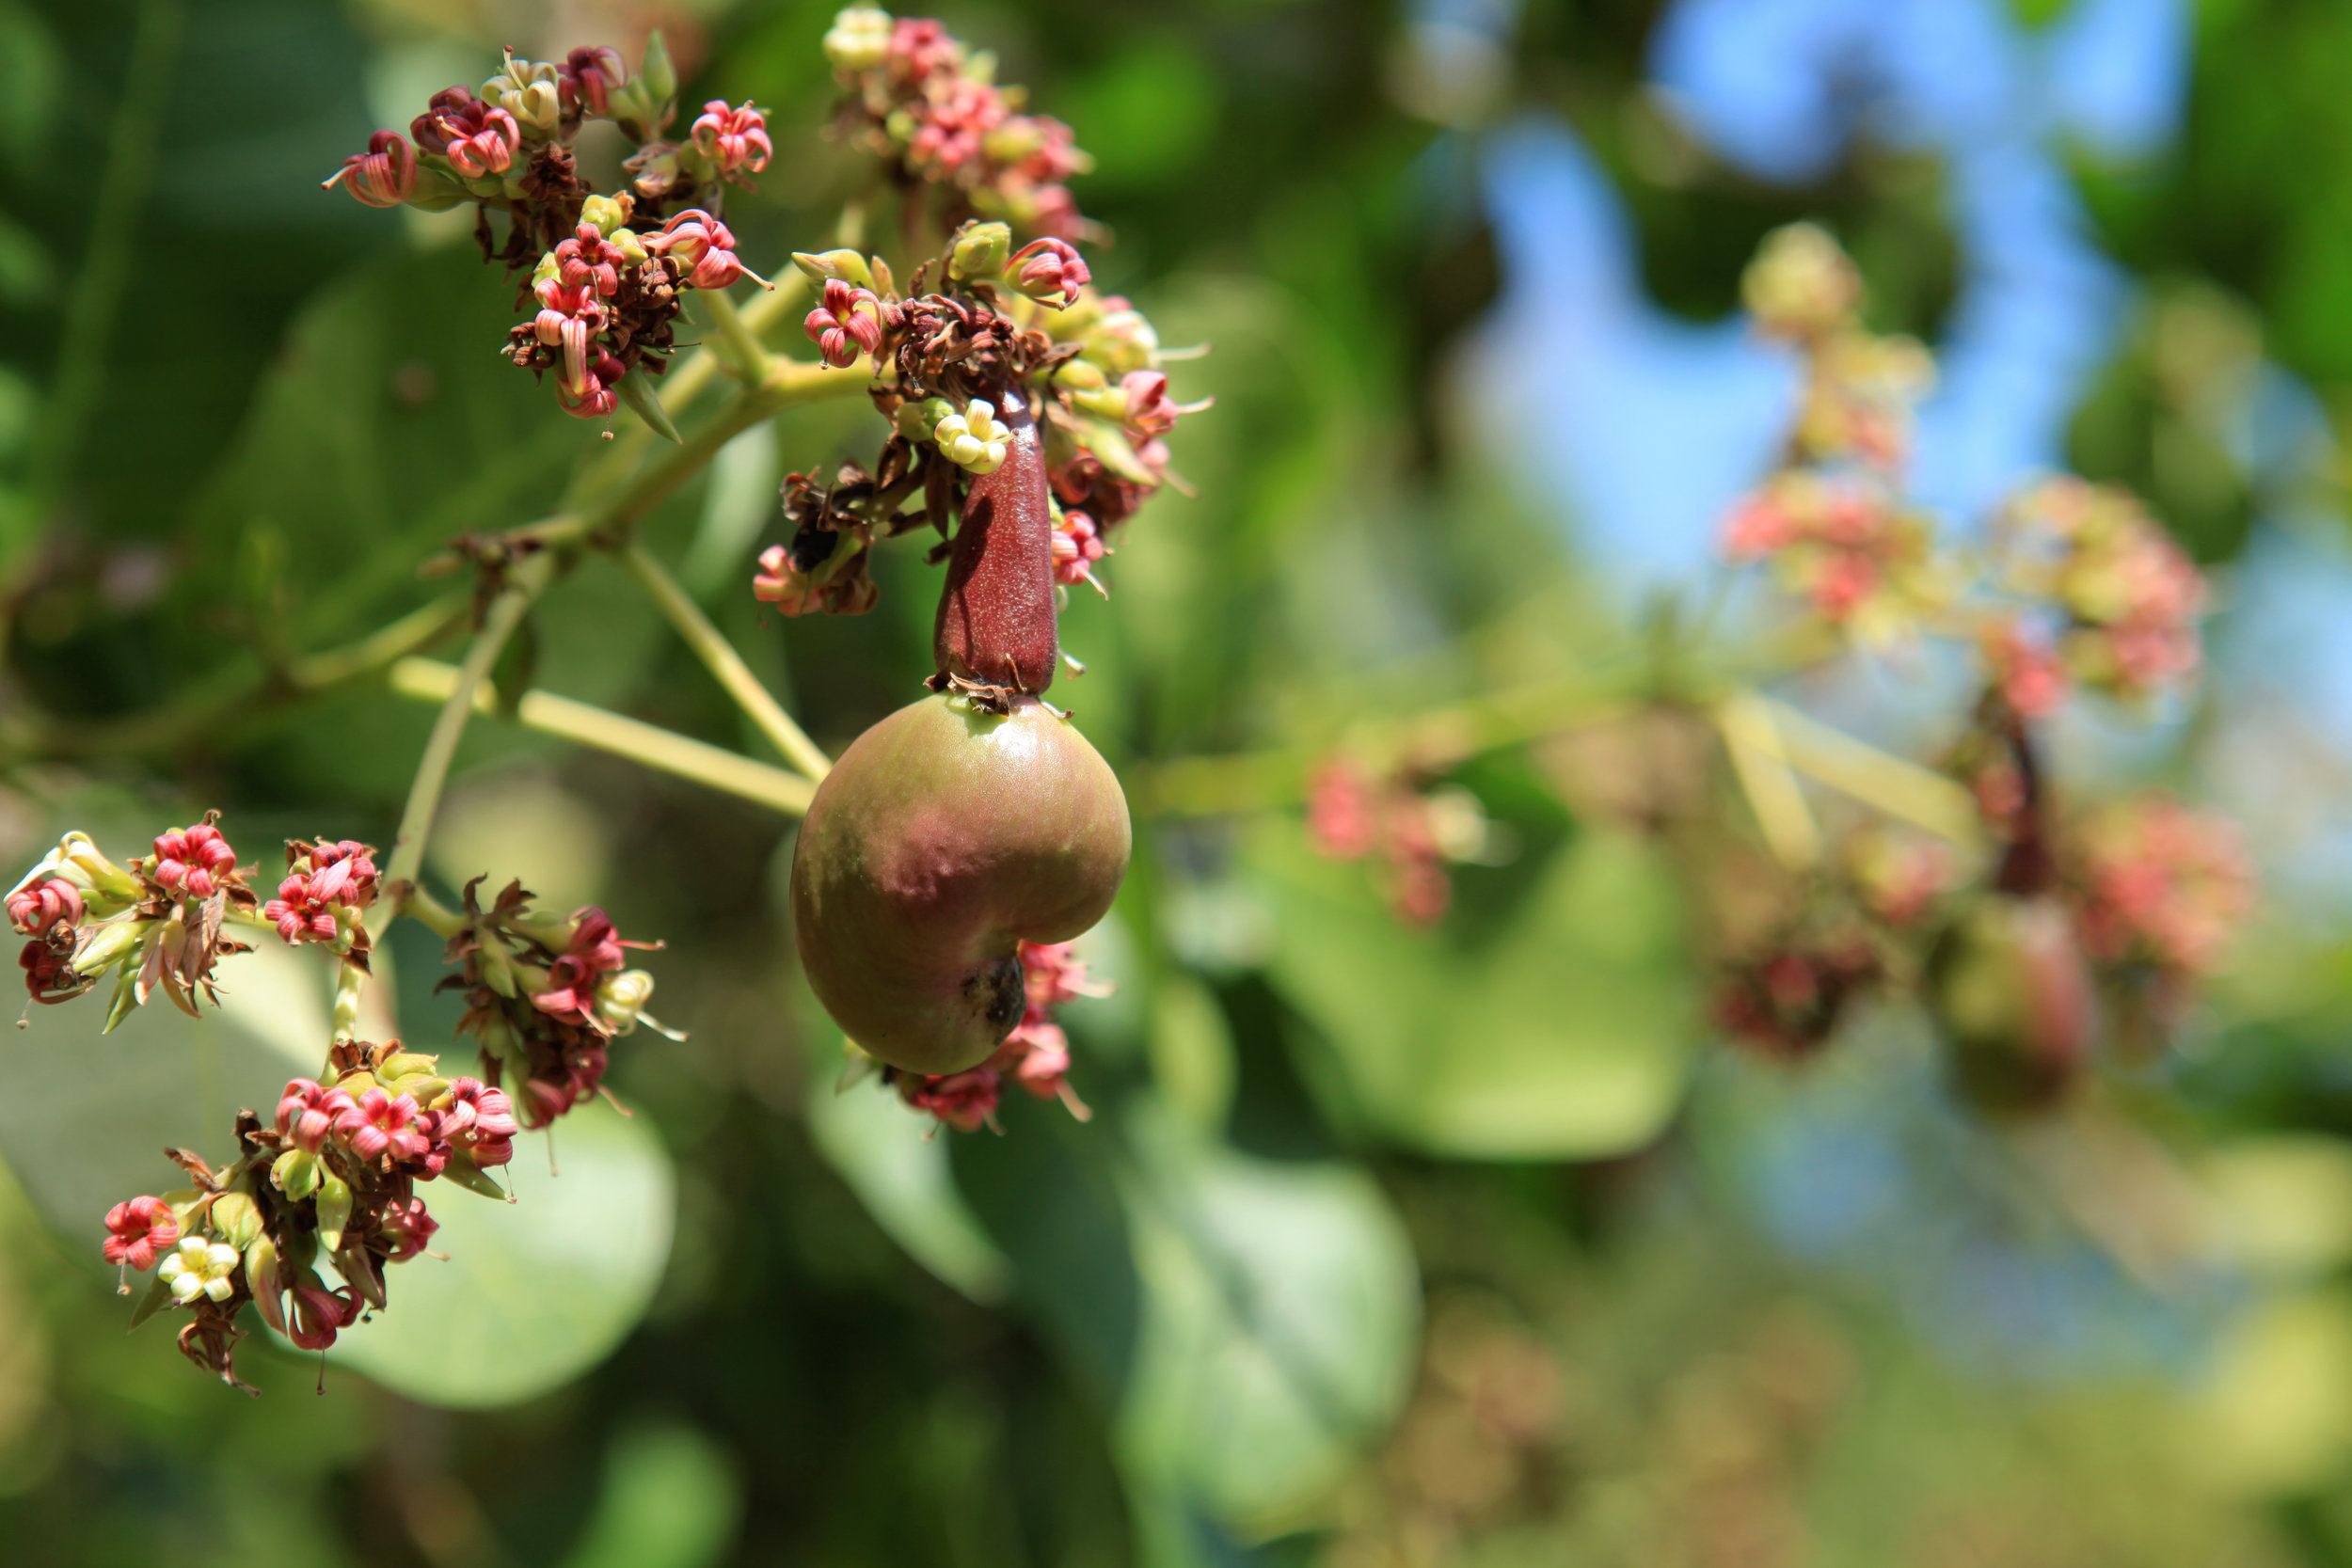 2017-9023-aguiladeosa-garden-produce.jpg